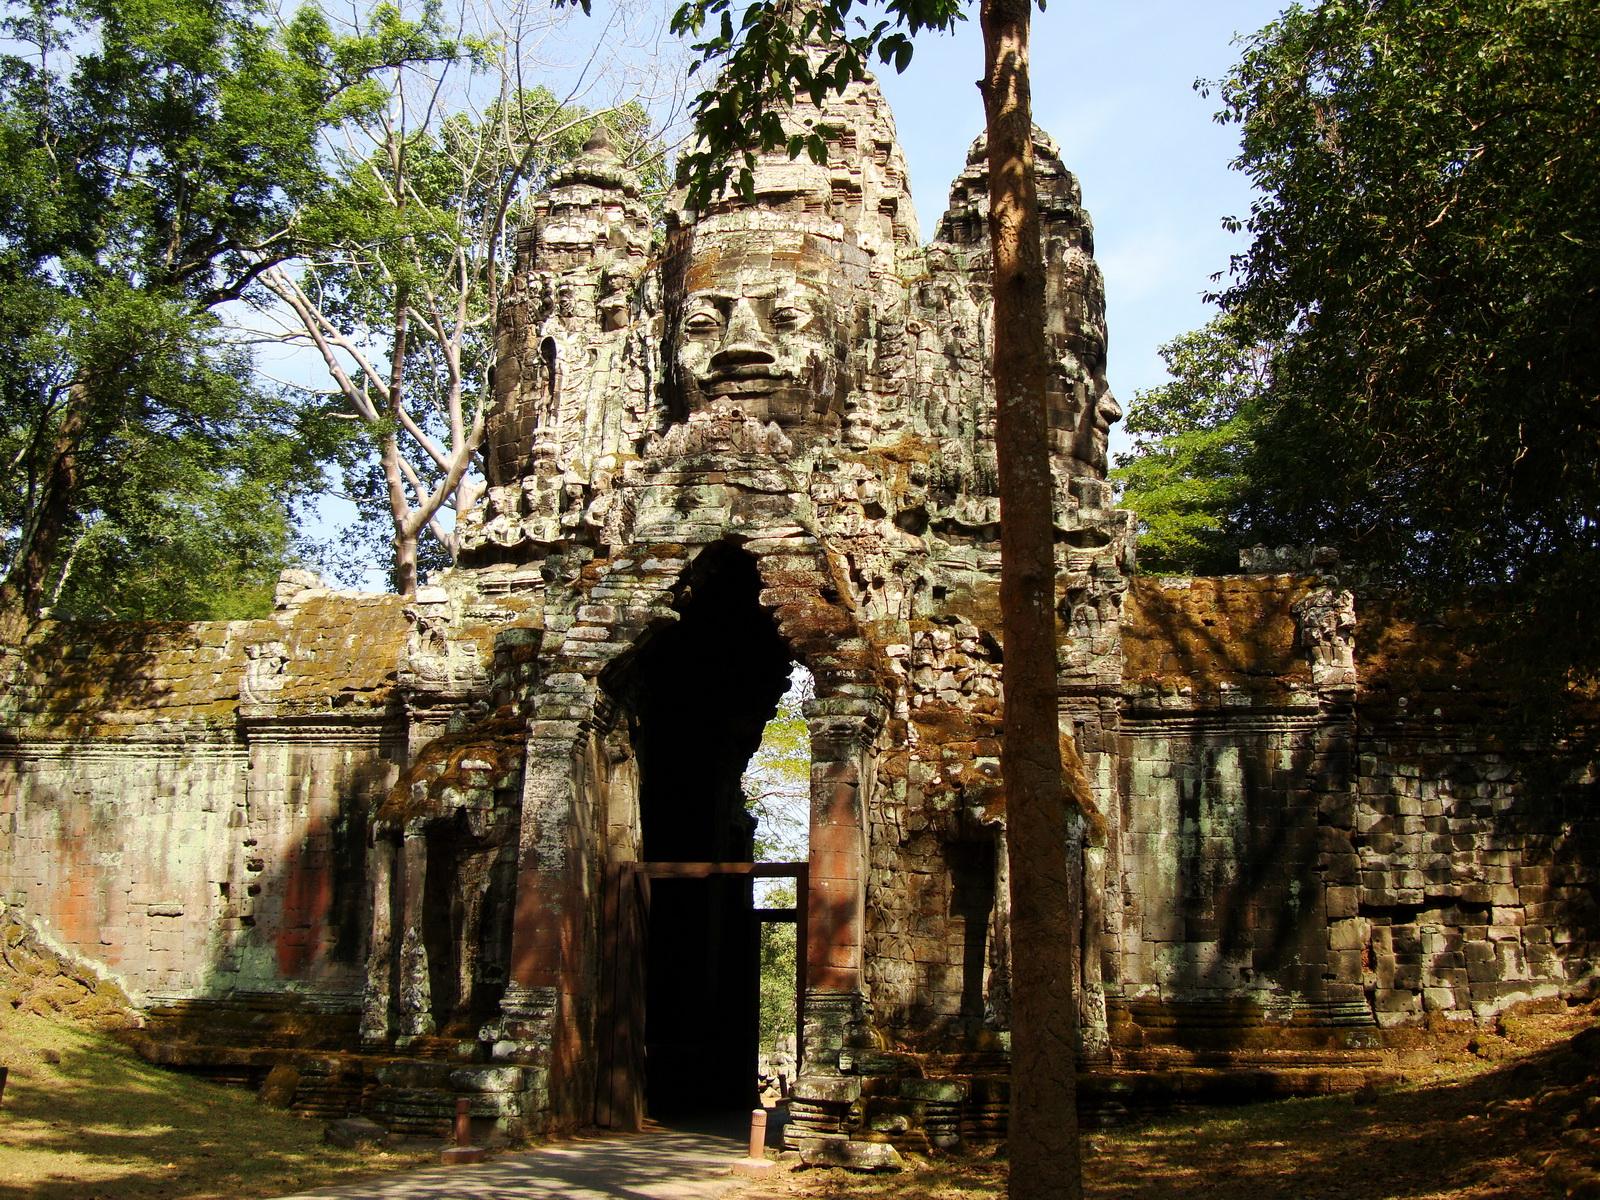 Angkor Wat style architecture North Gate Jan 2010 10